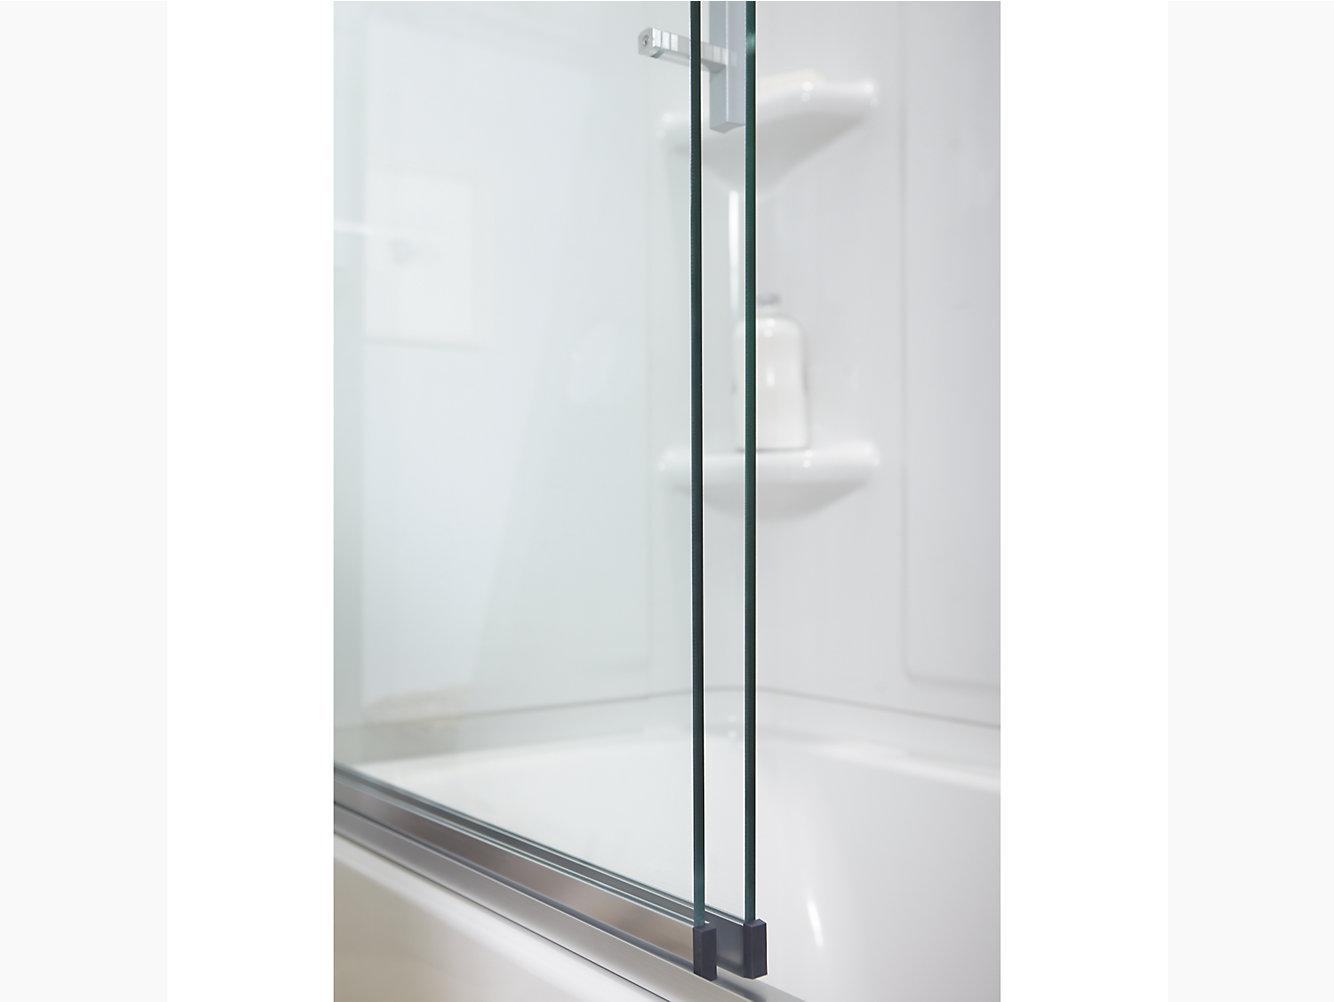 Finesse Peak Frameless Sliding Bath Door 56 5859 58 W X 55 12